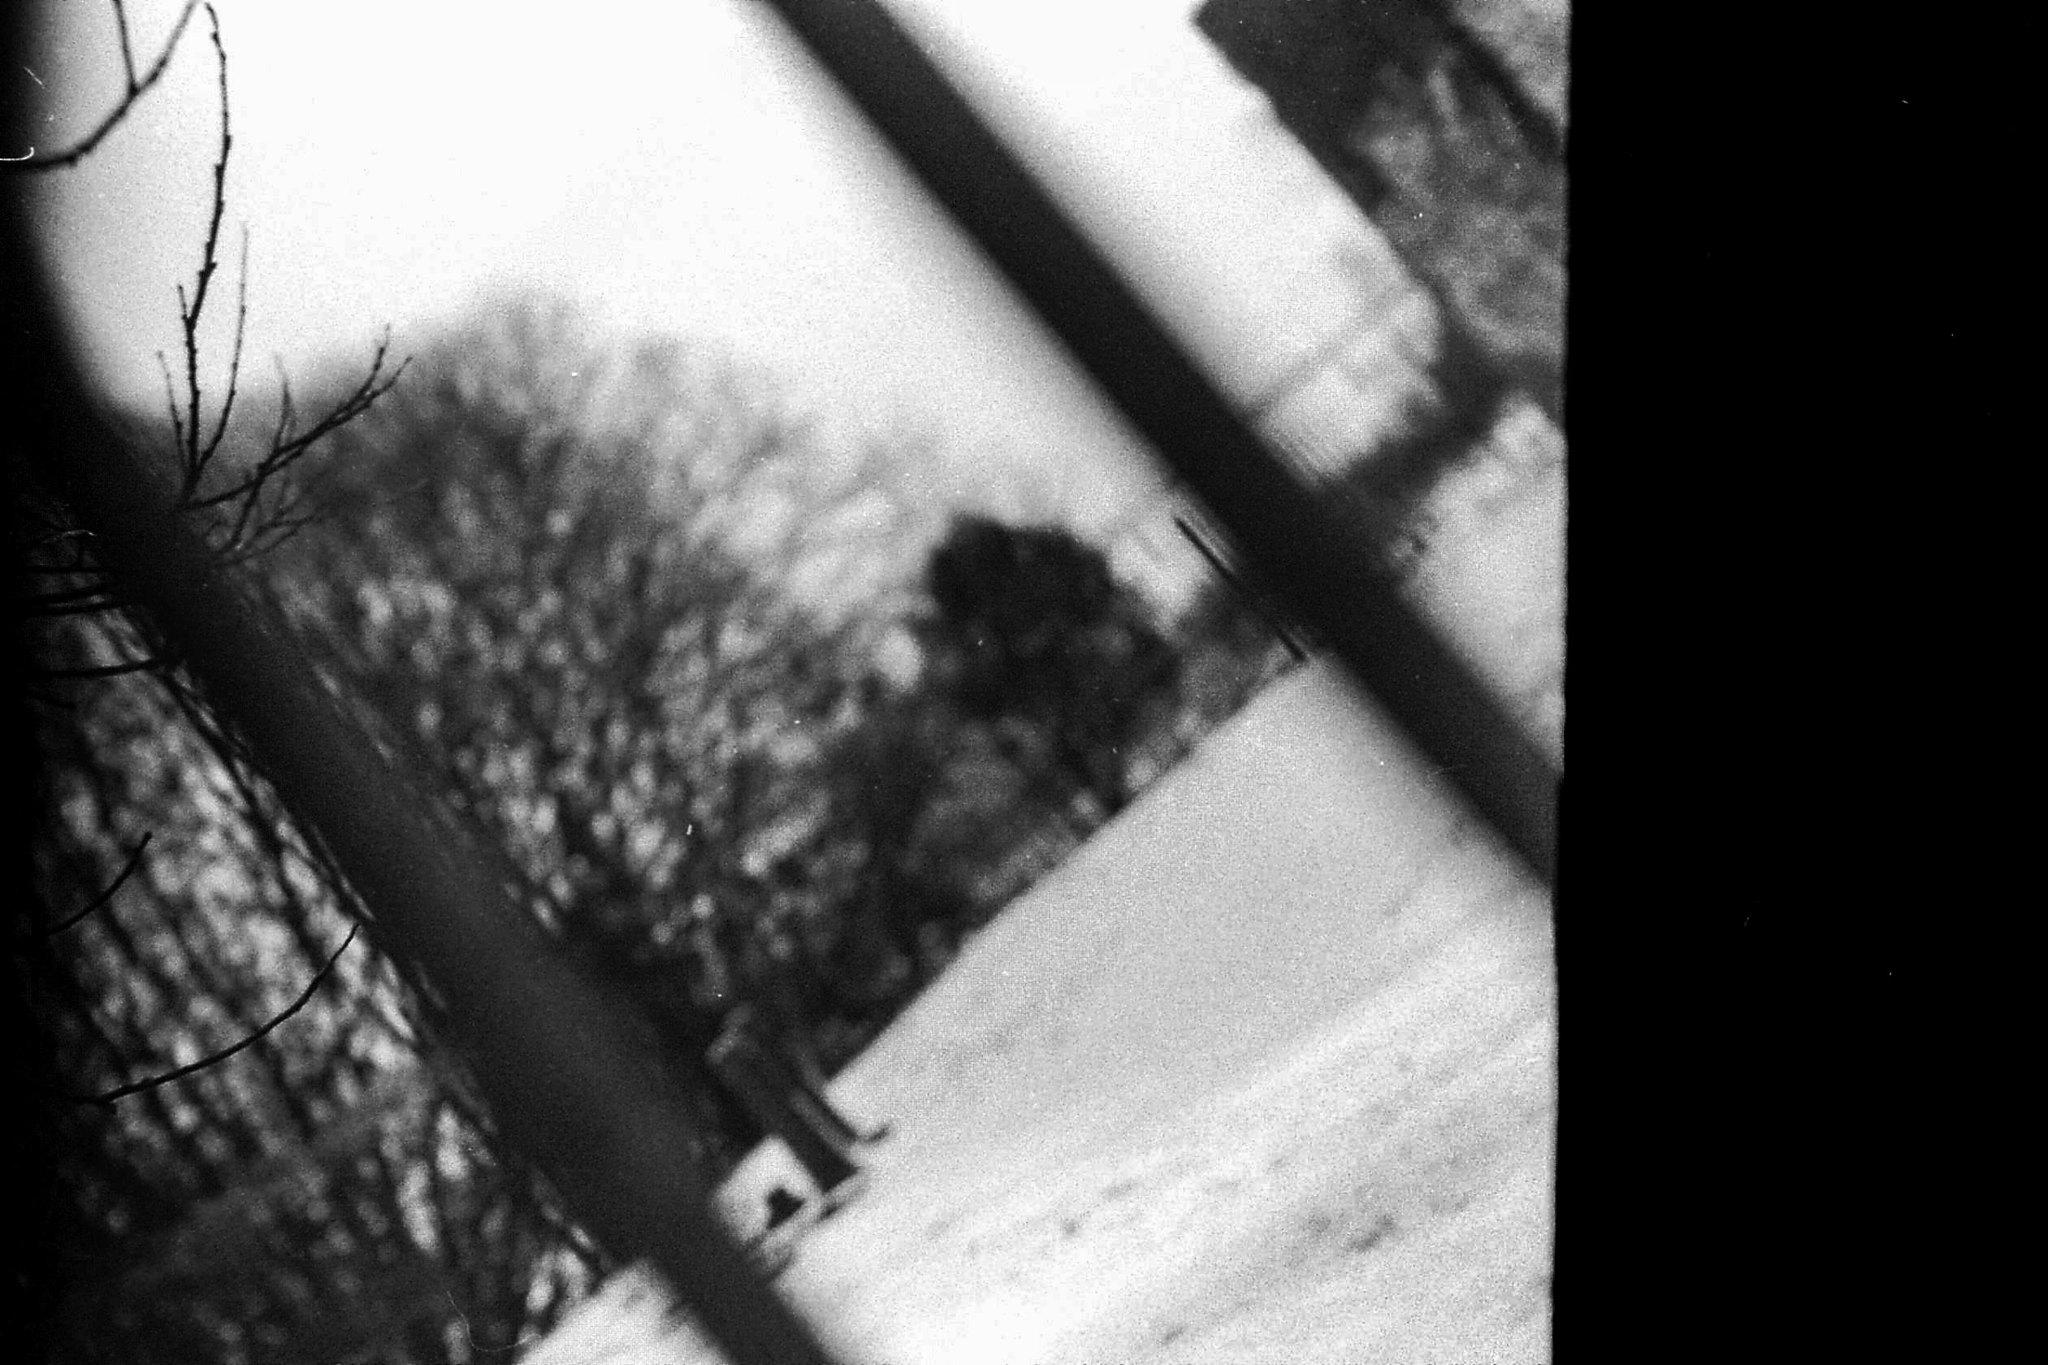 last piece of film